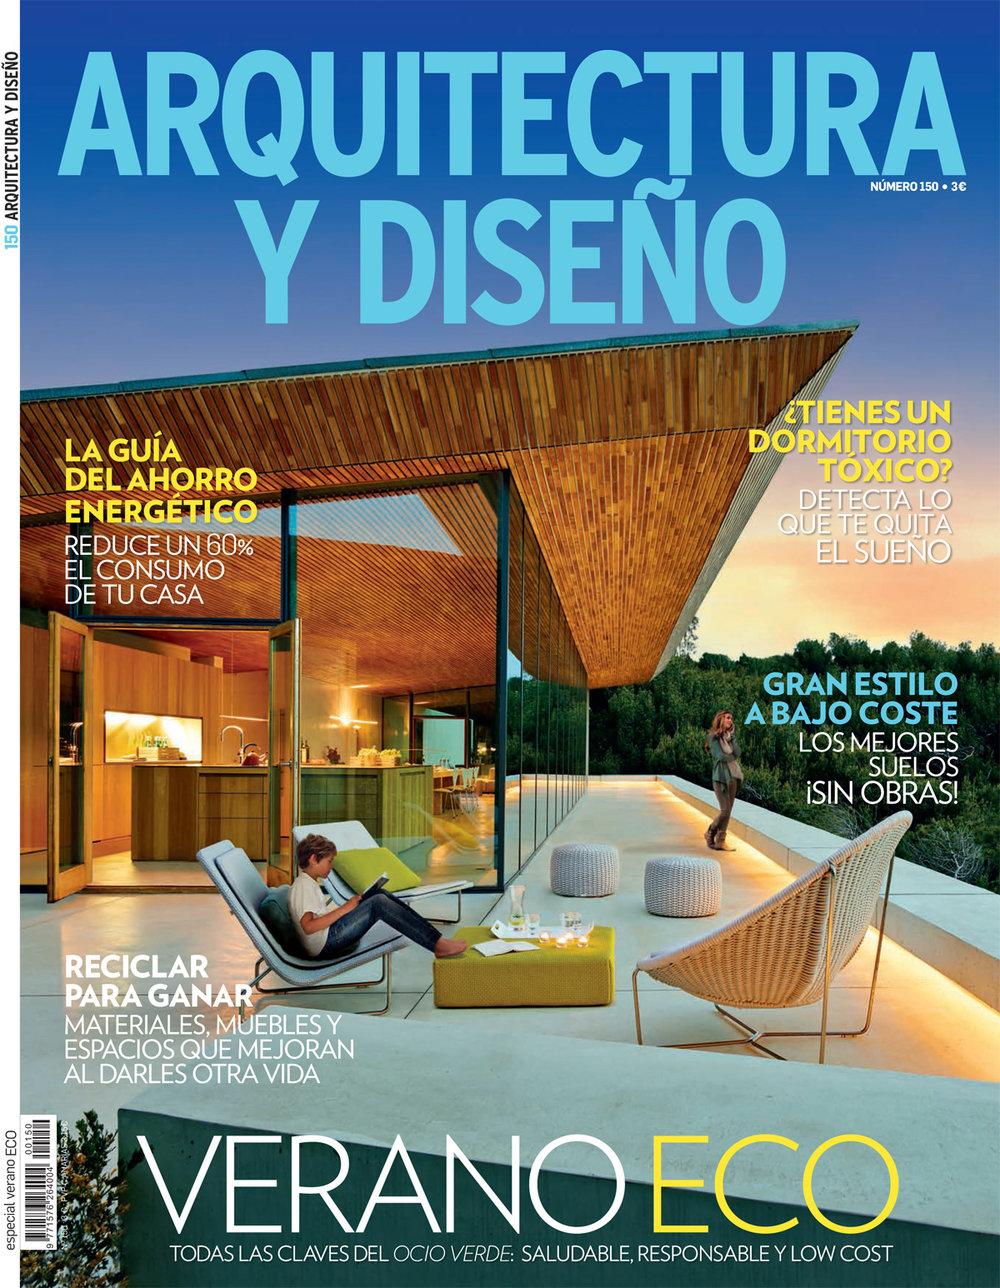 ARQUITECTURA Y DISENO (Spain). July 2013. Print